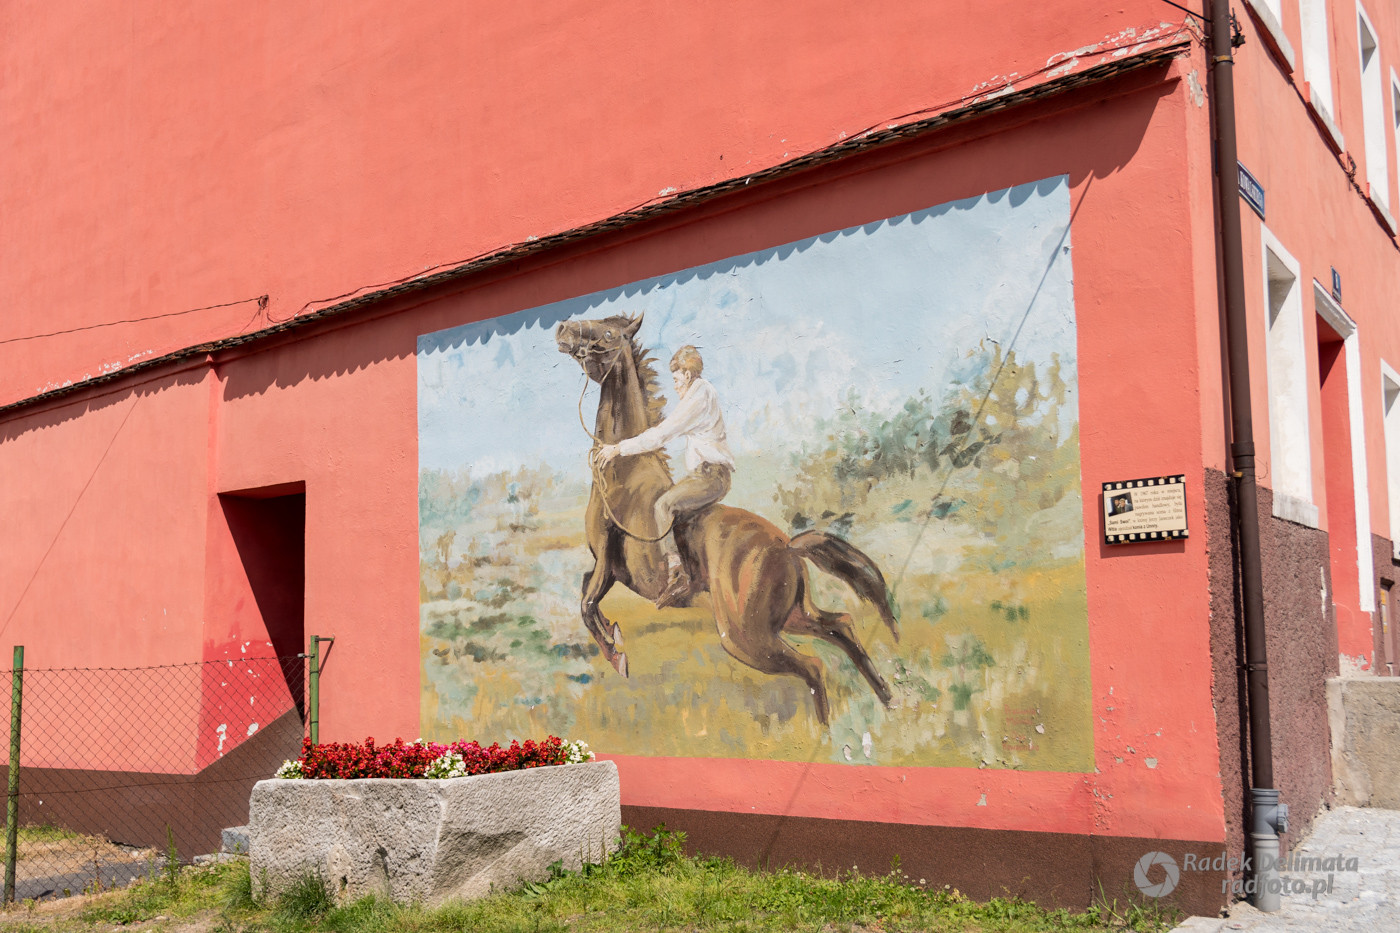 Lubomierz Muzeum Kargula i Pawlaka